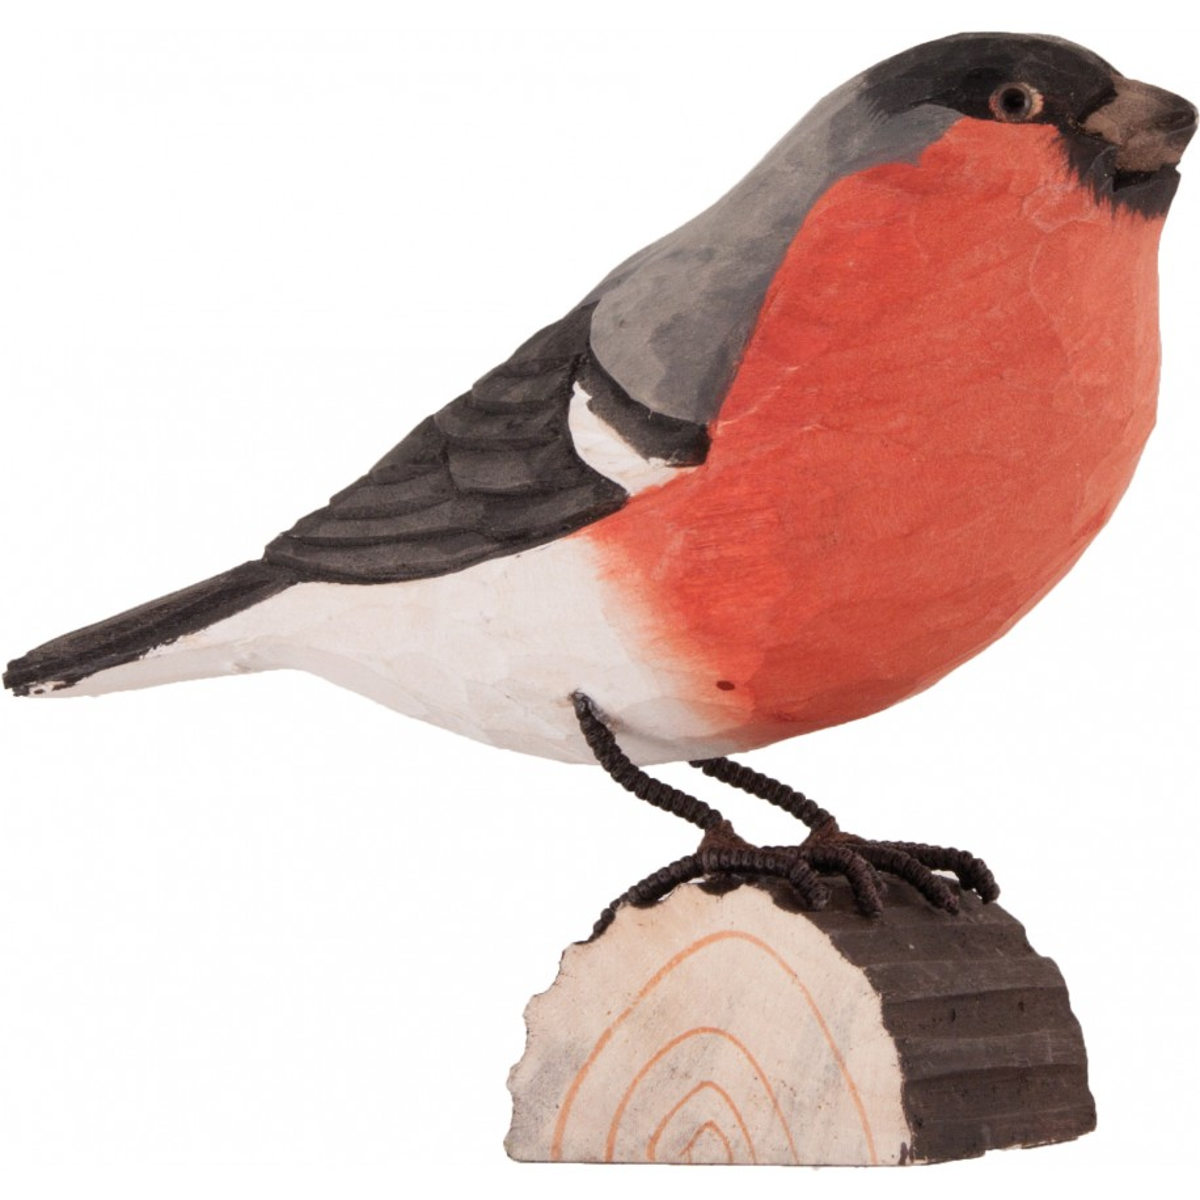 Wildlife Garden træfugl - dompap